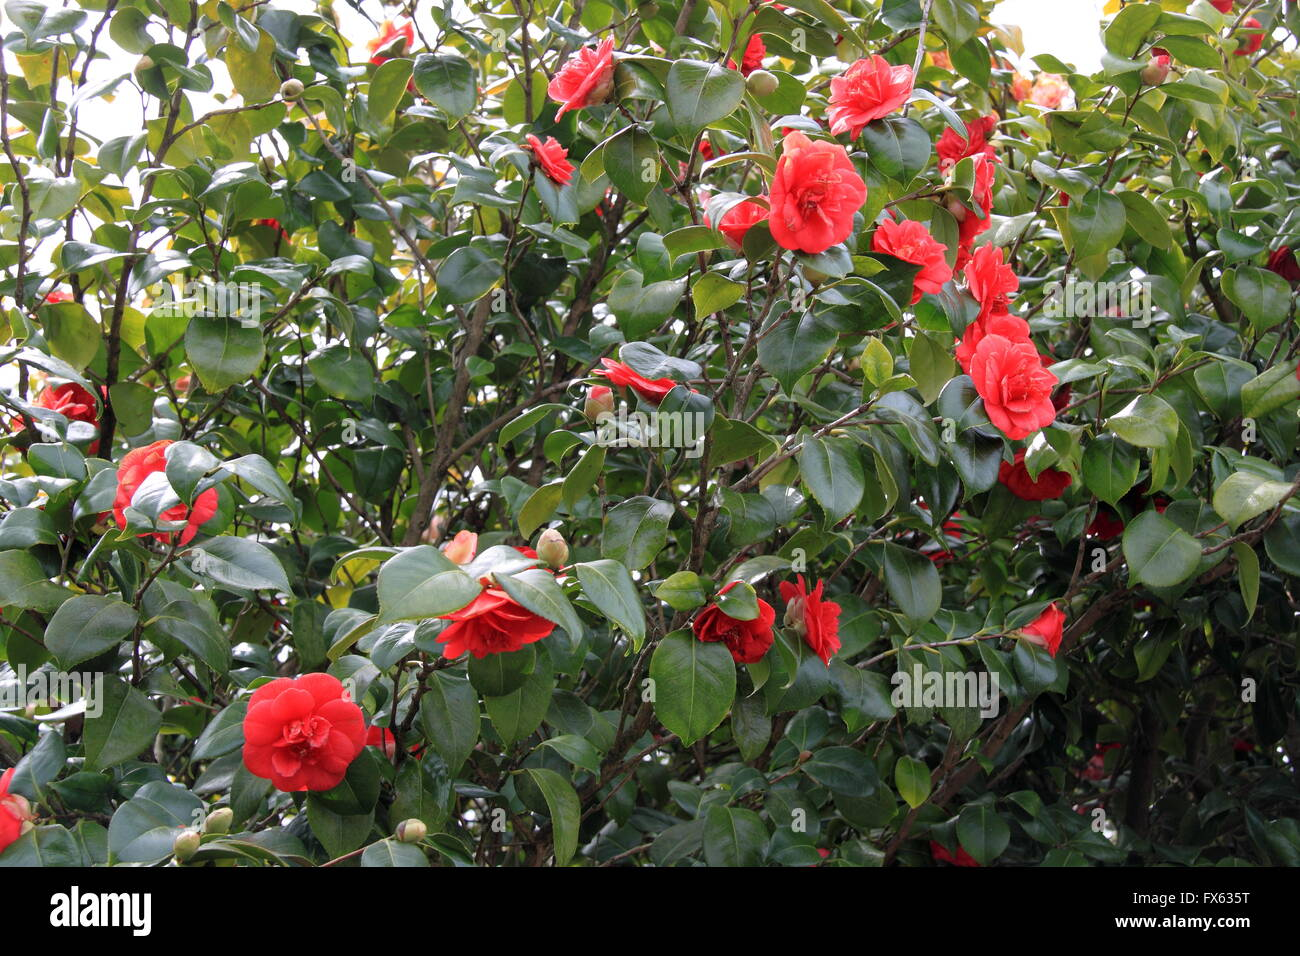 Camellia Japonica Roger Hall camellia camellia japonica flowering stock photos & camellia